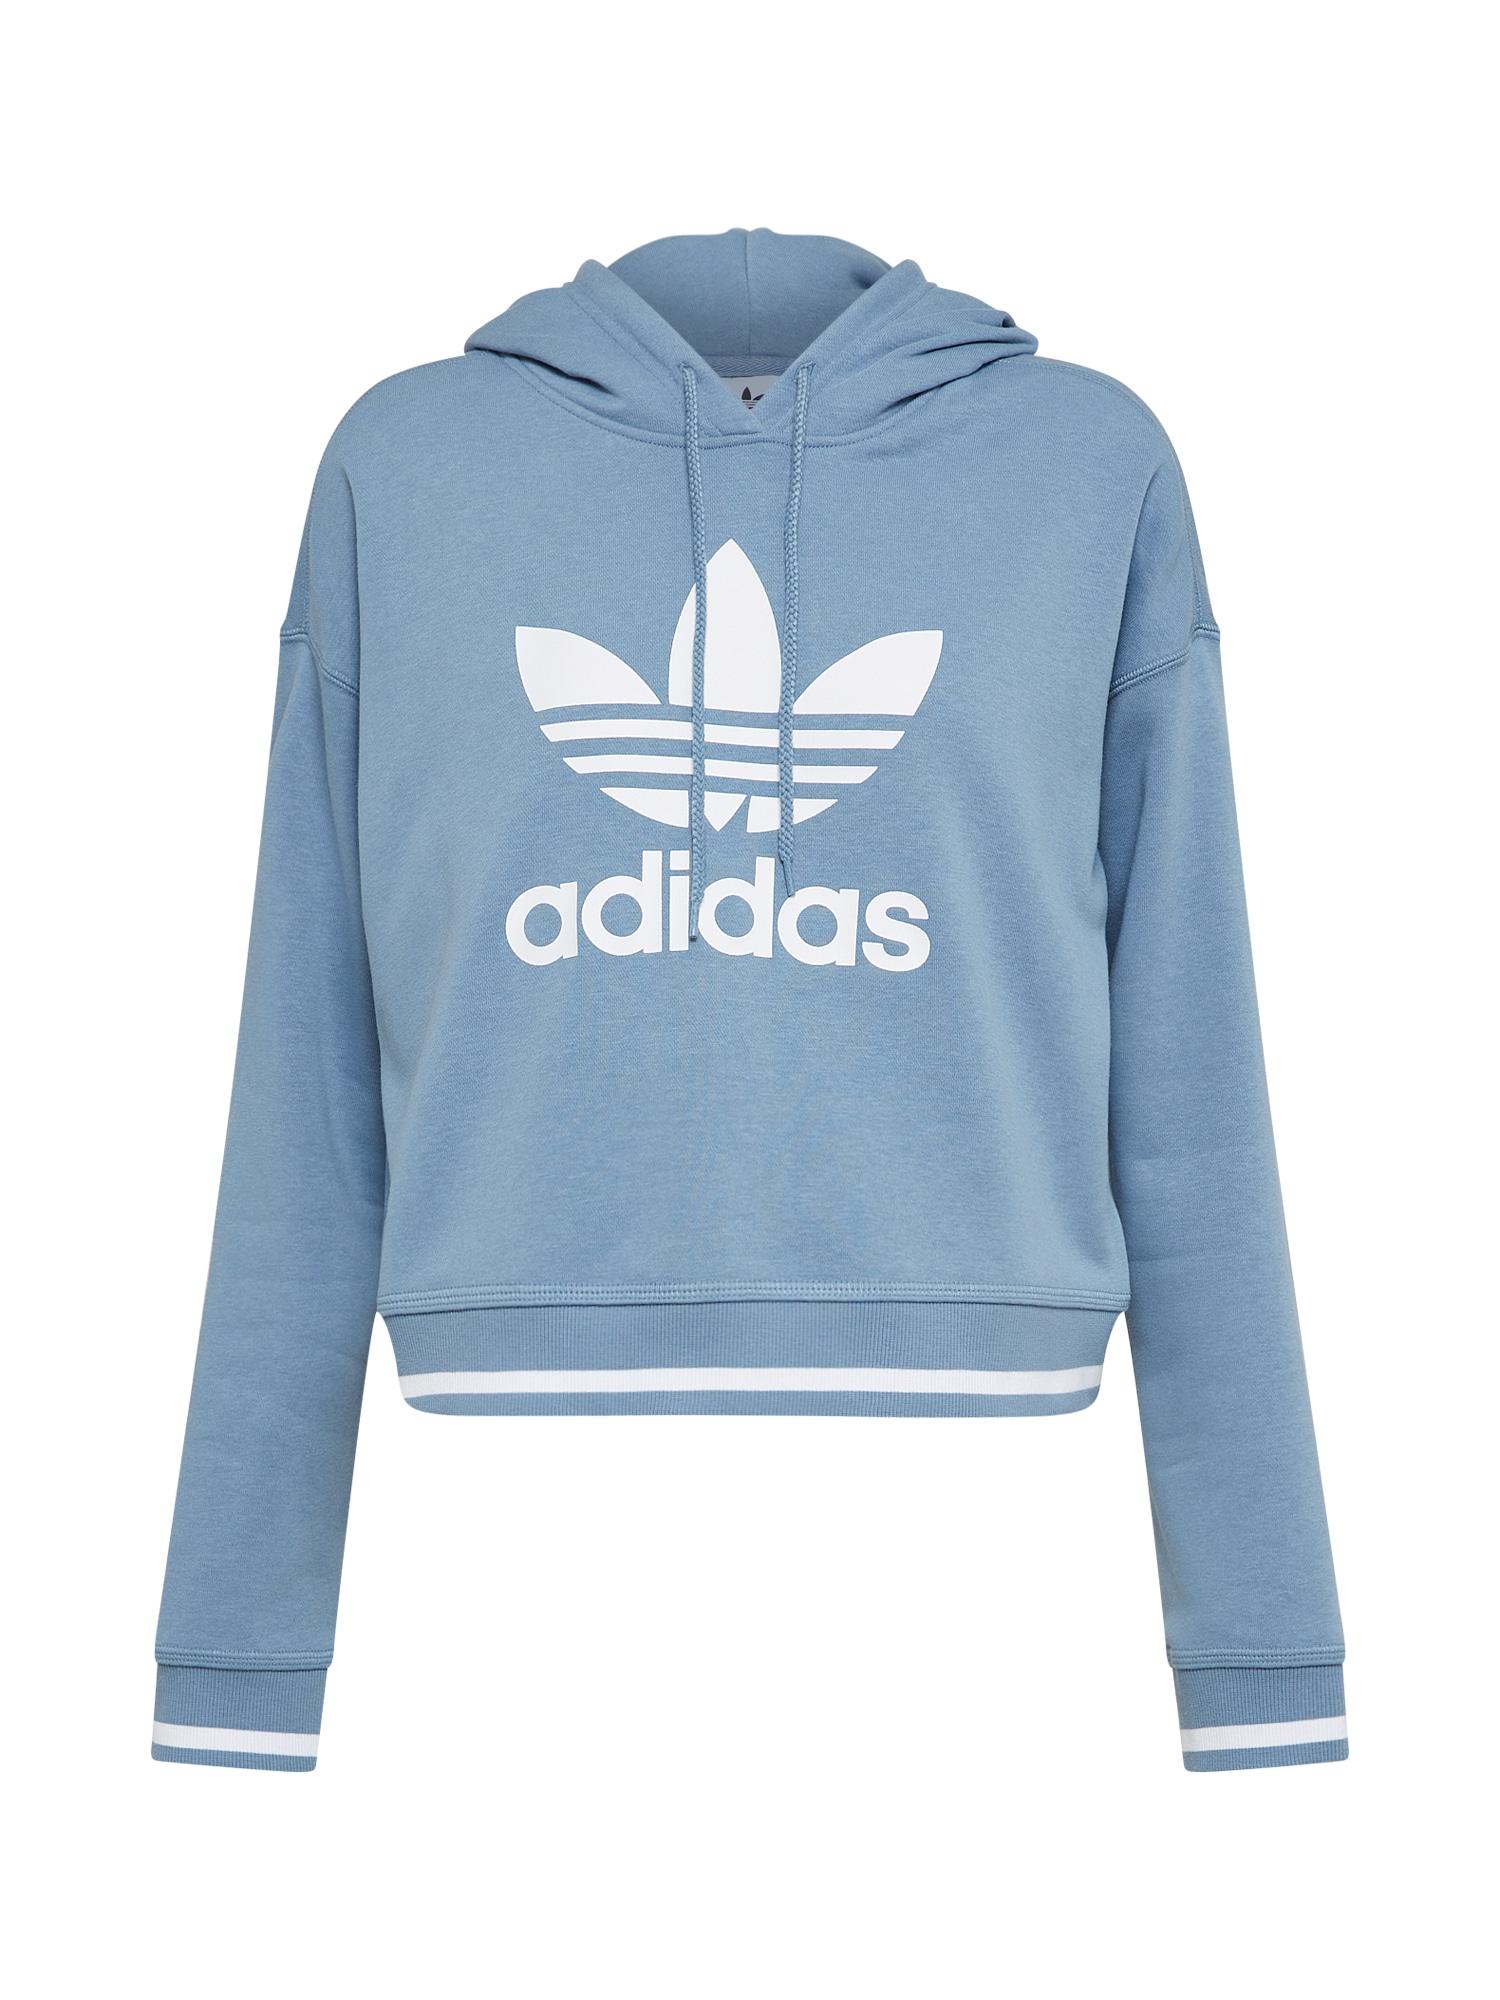 ADIDAS ORIGINALS, Dames Sweatshirt, smoky blue / wit